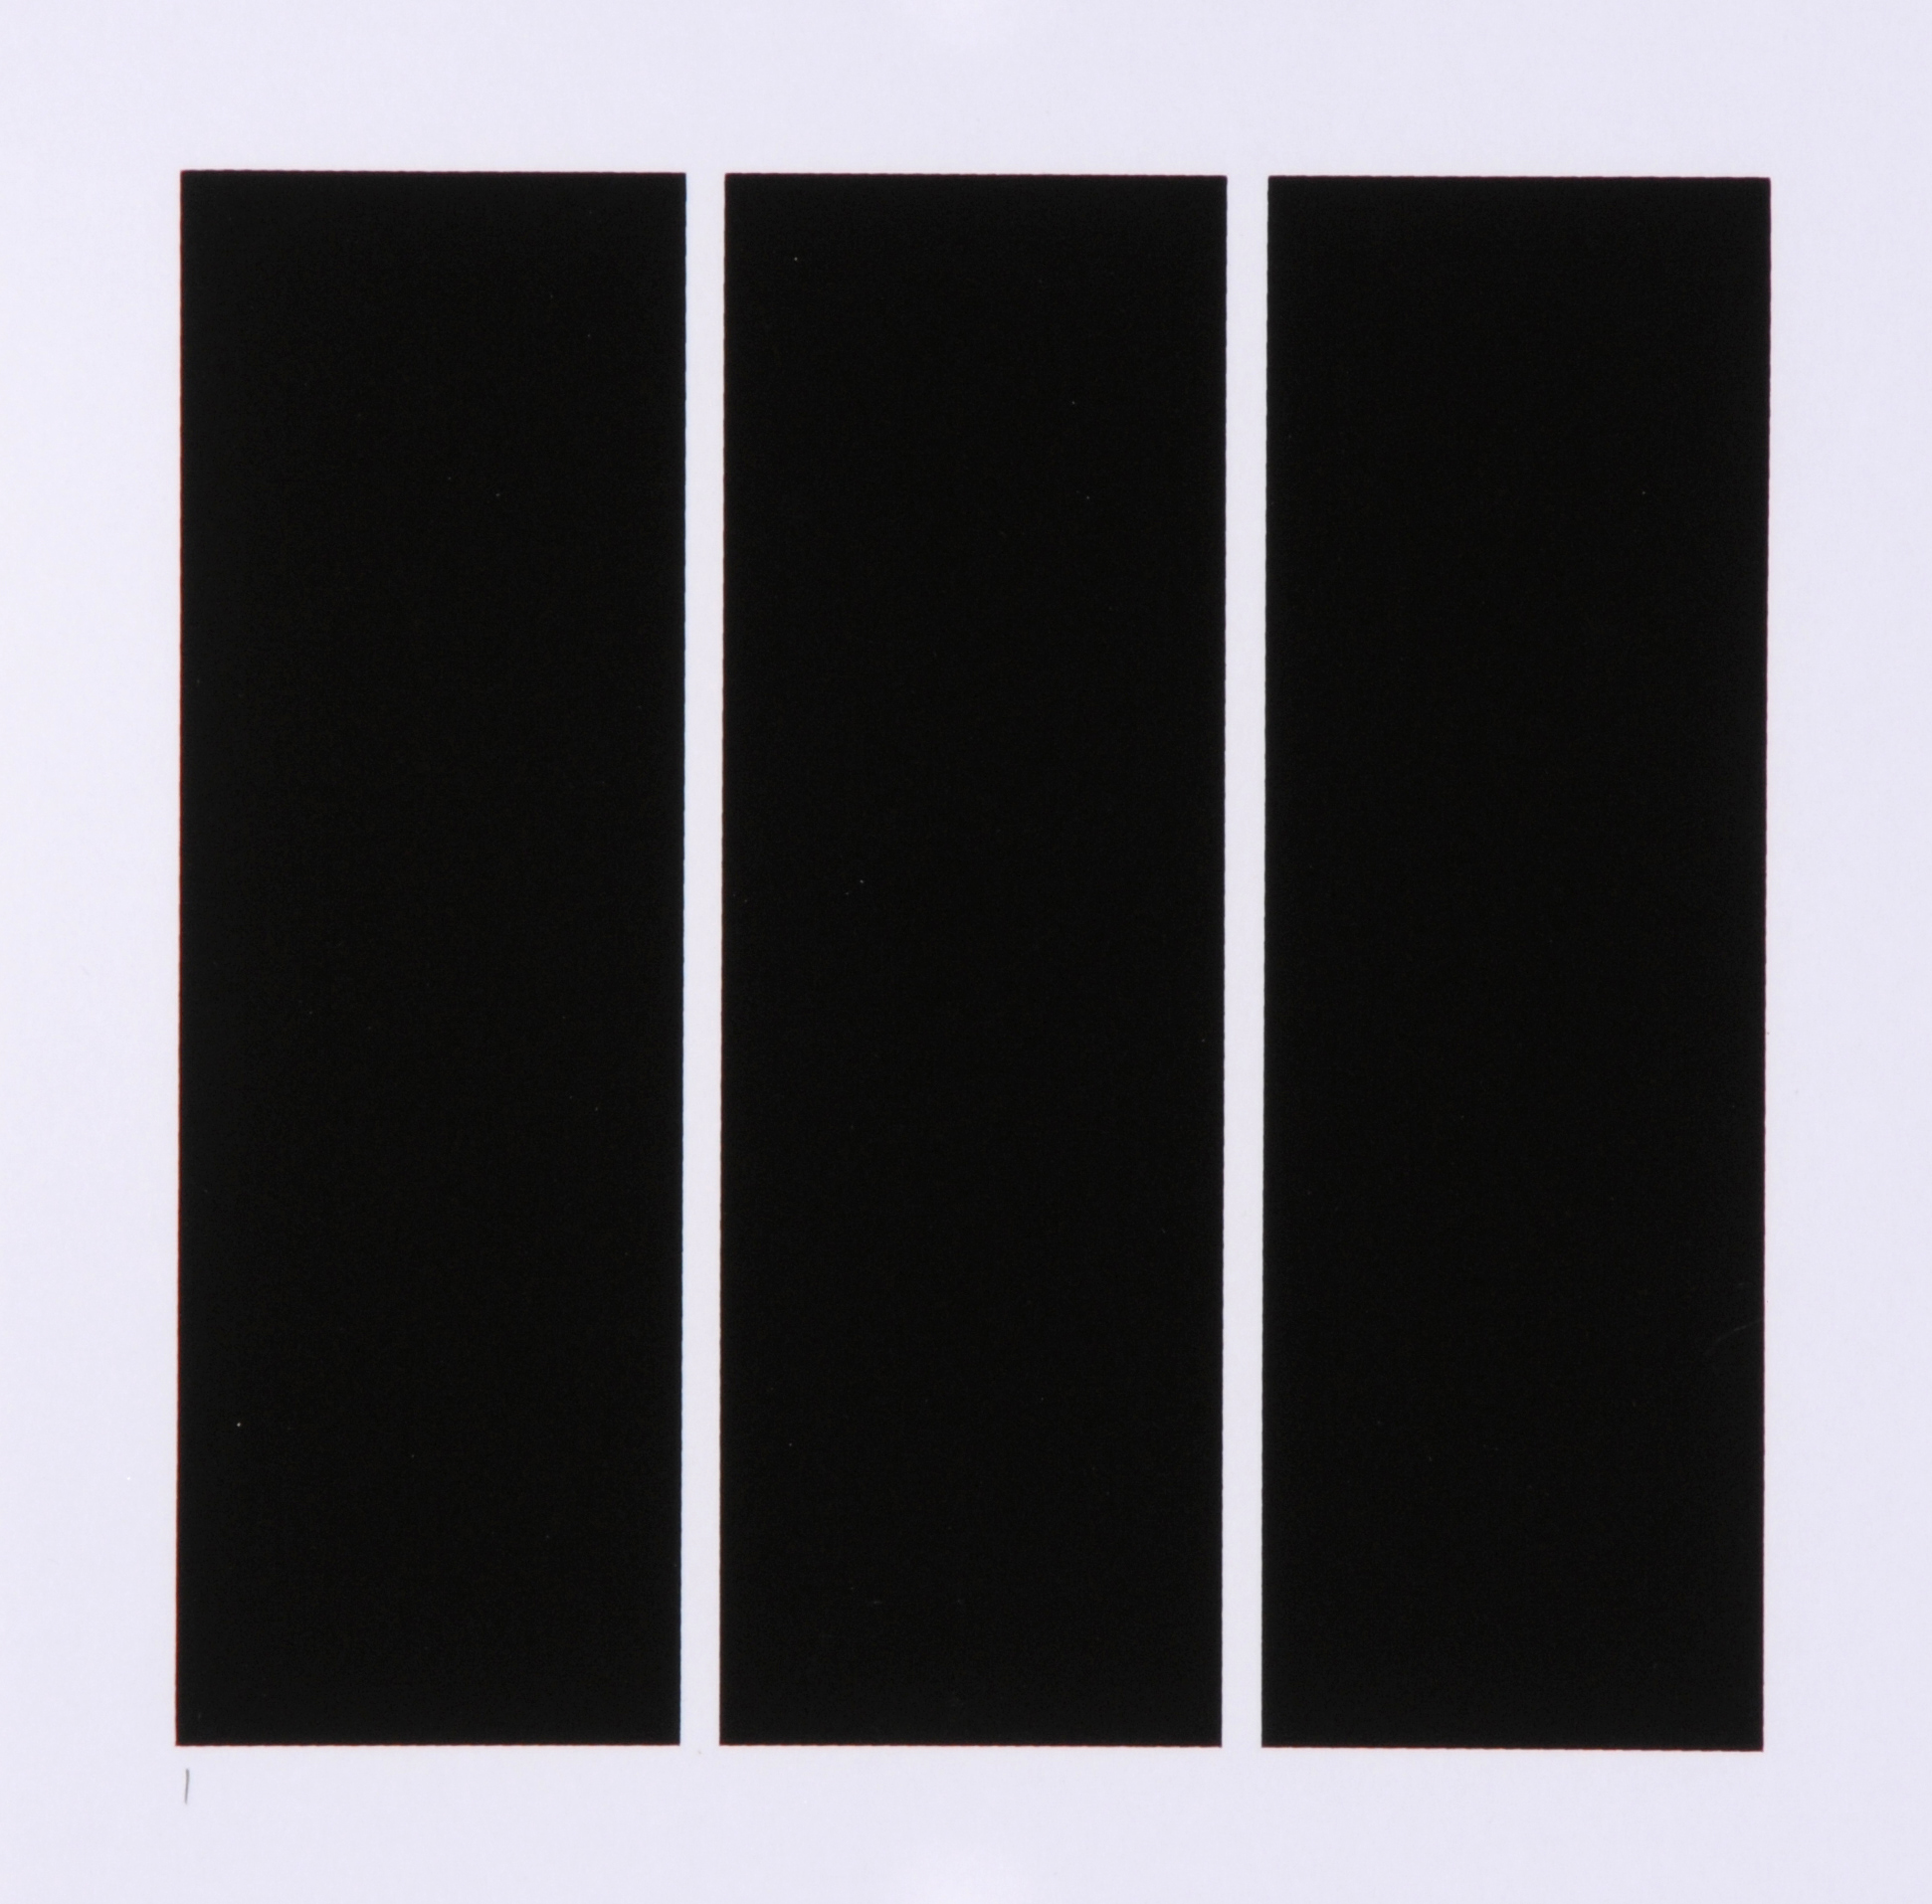 Badur Frank, Portfolio: 64 Varianten